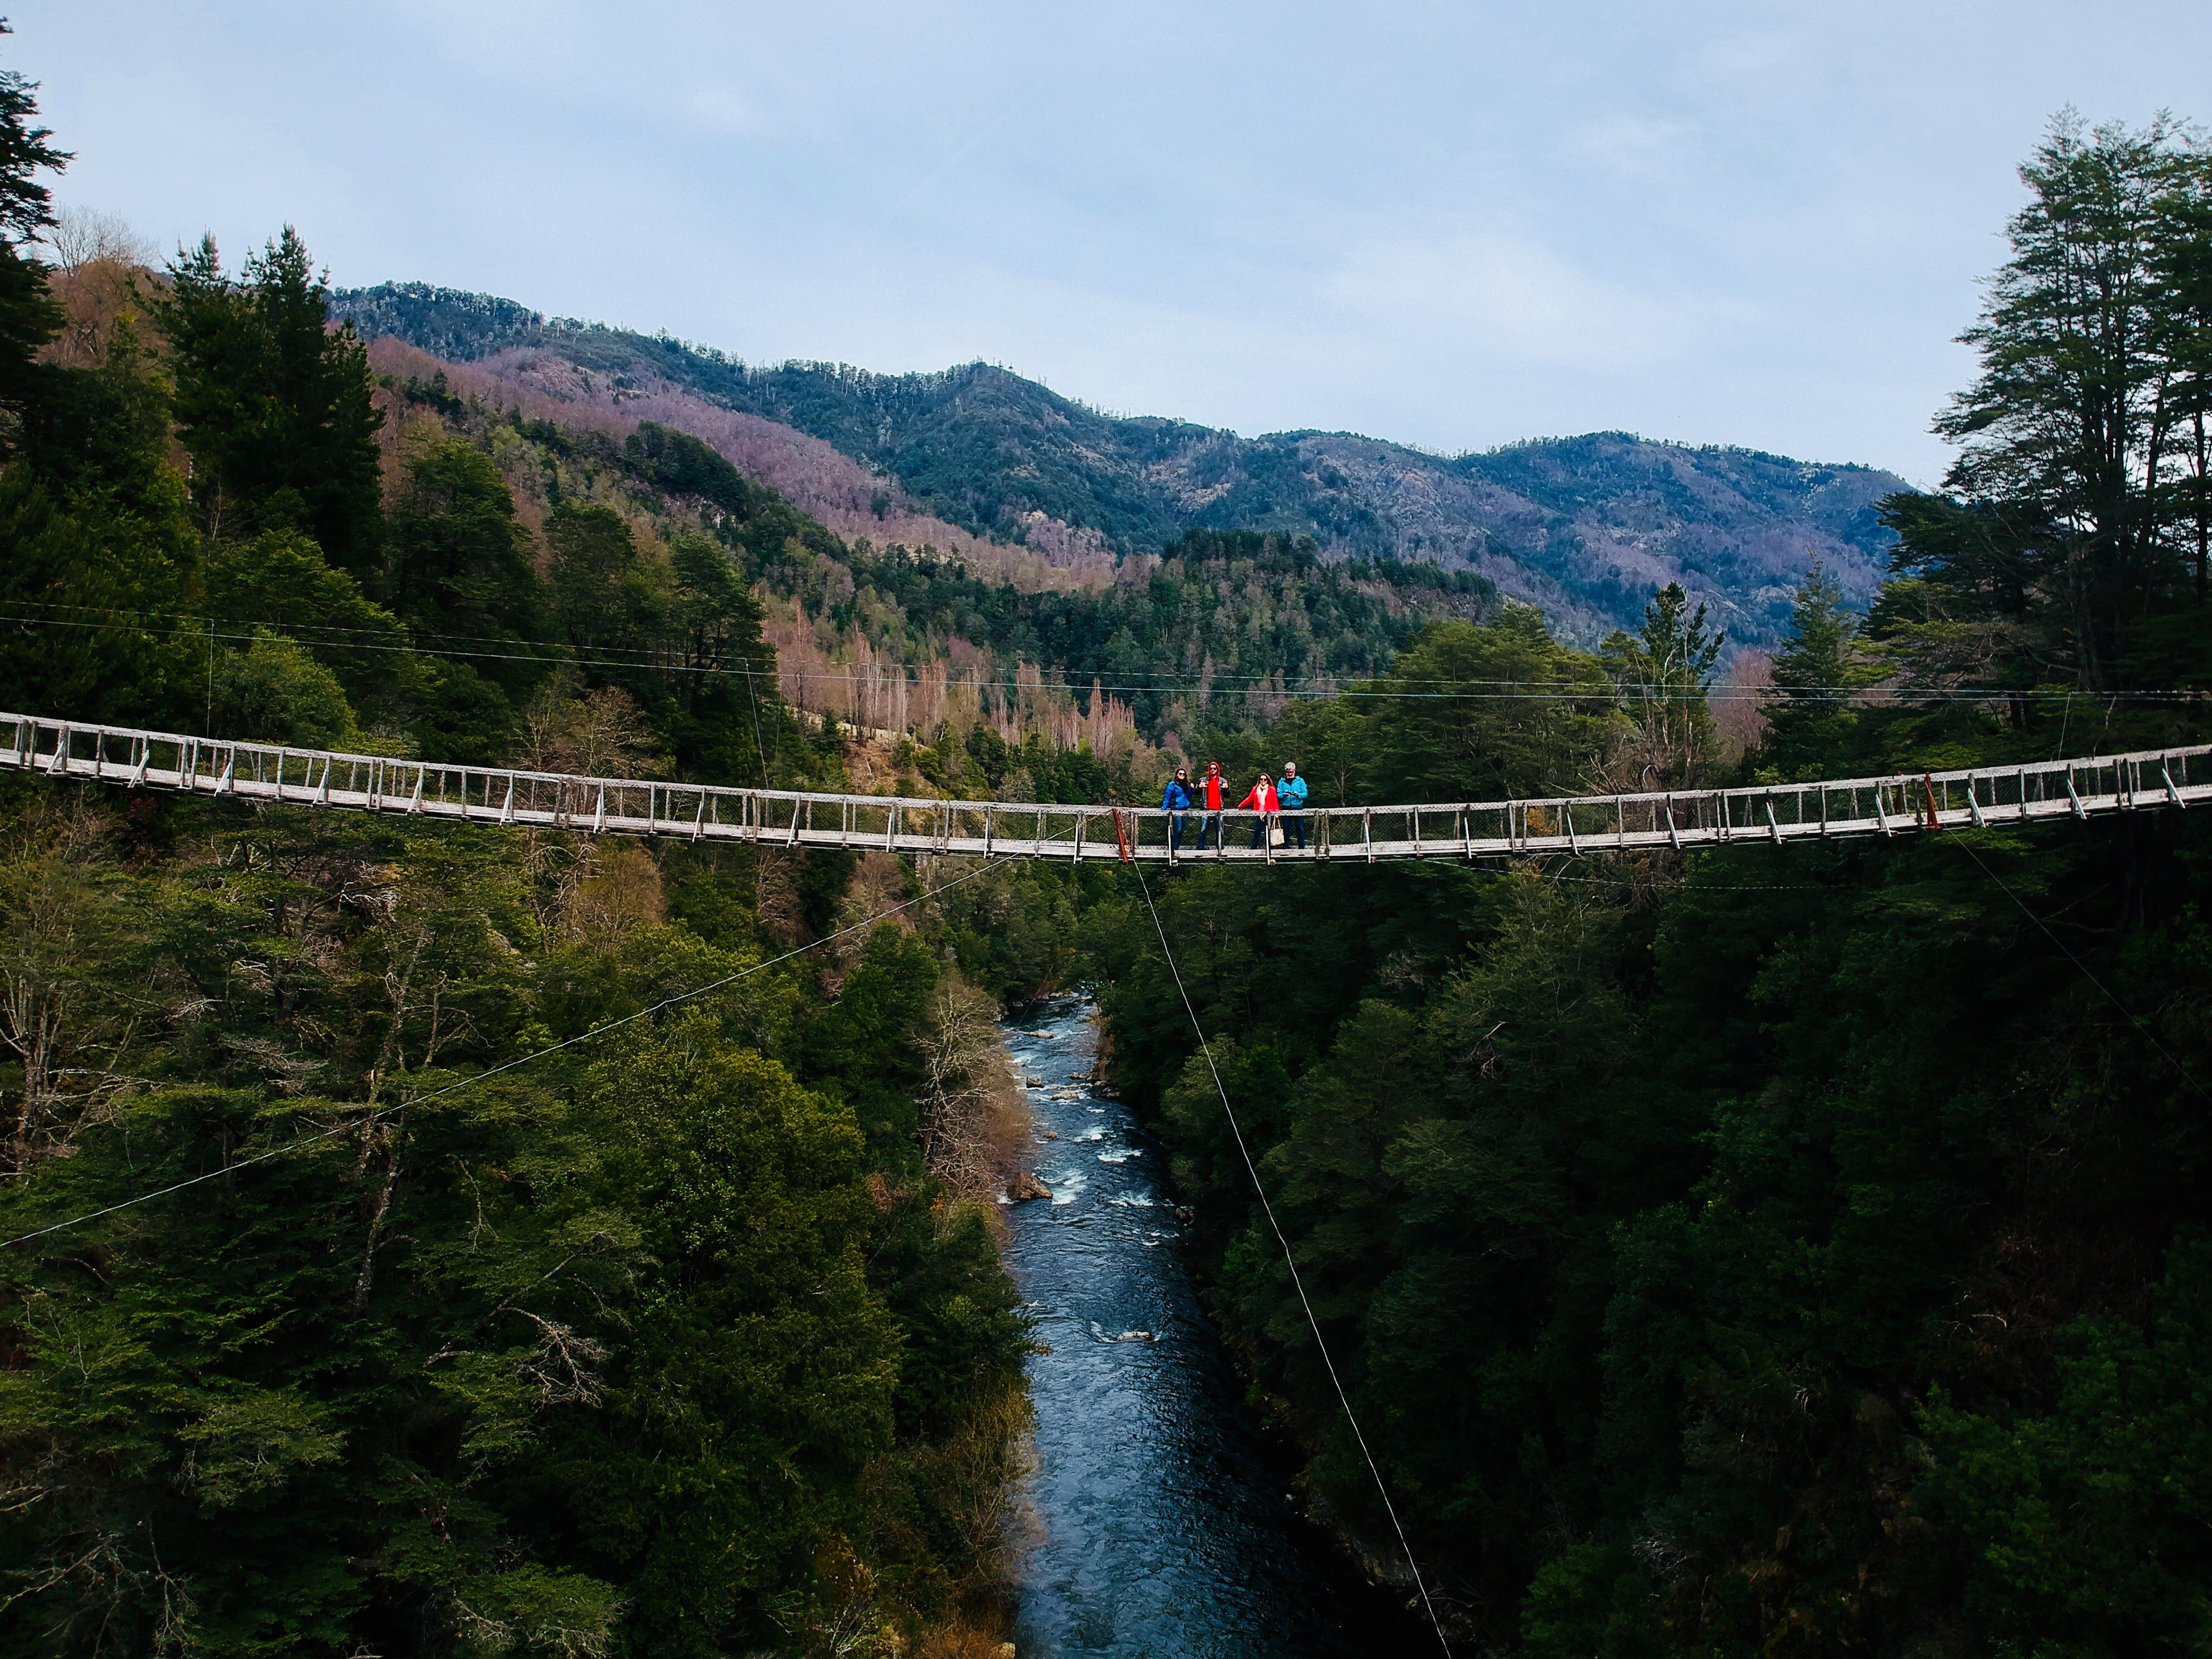 People standing on bridge photo